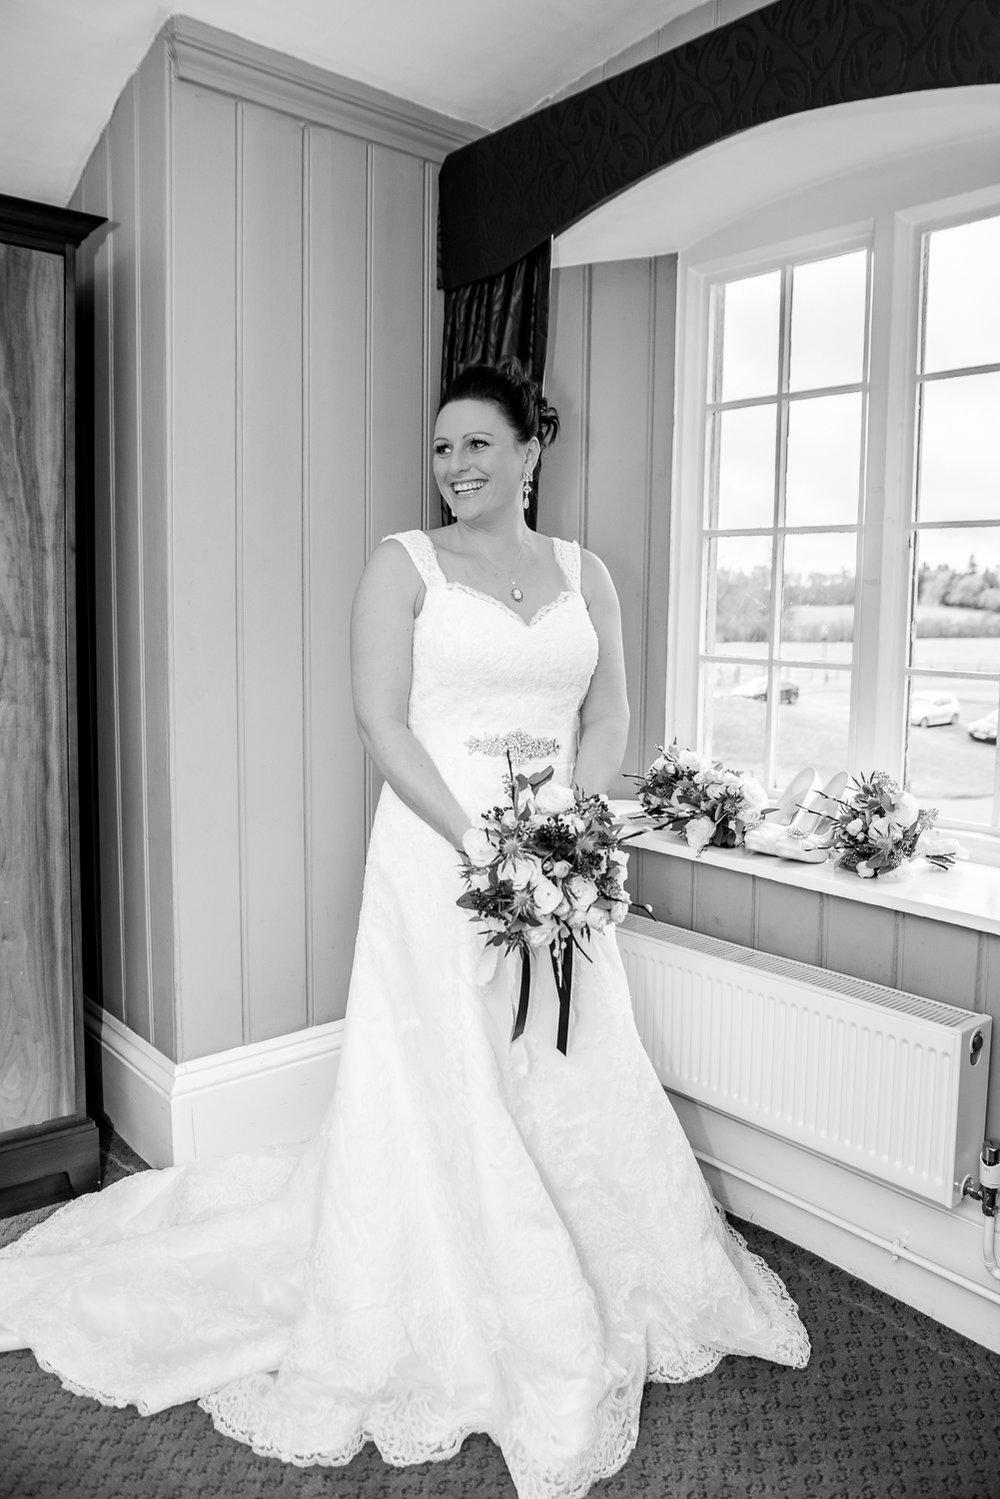 Shropshire Wedding Photographer Notton House Photography www.nottonhousephotography.com